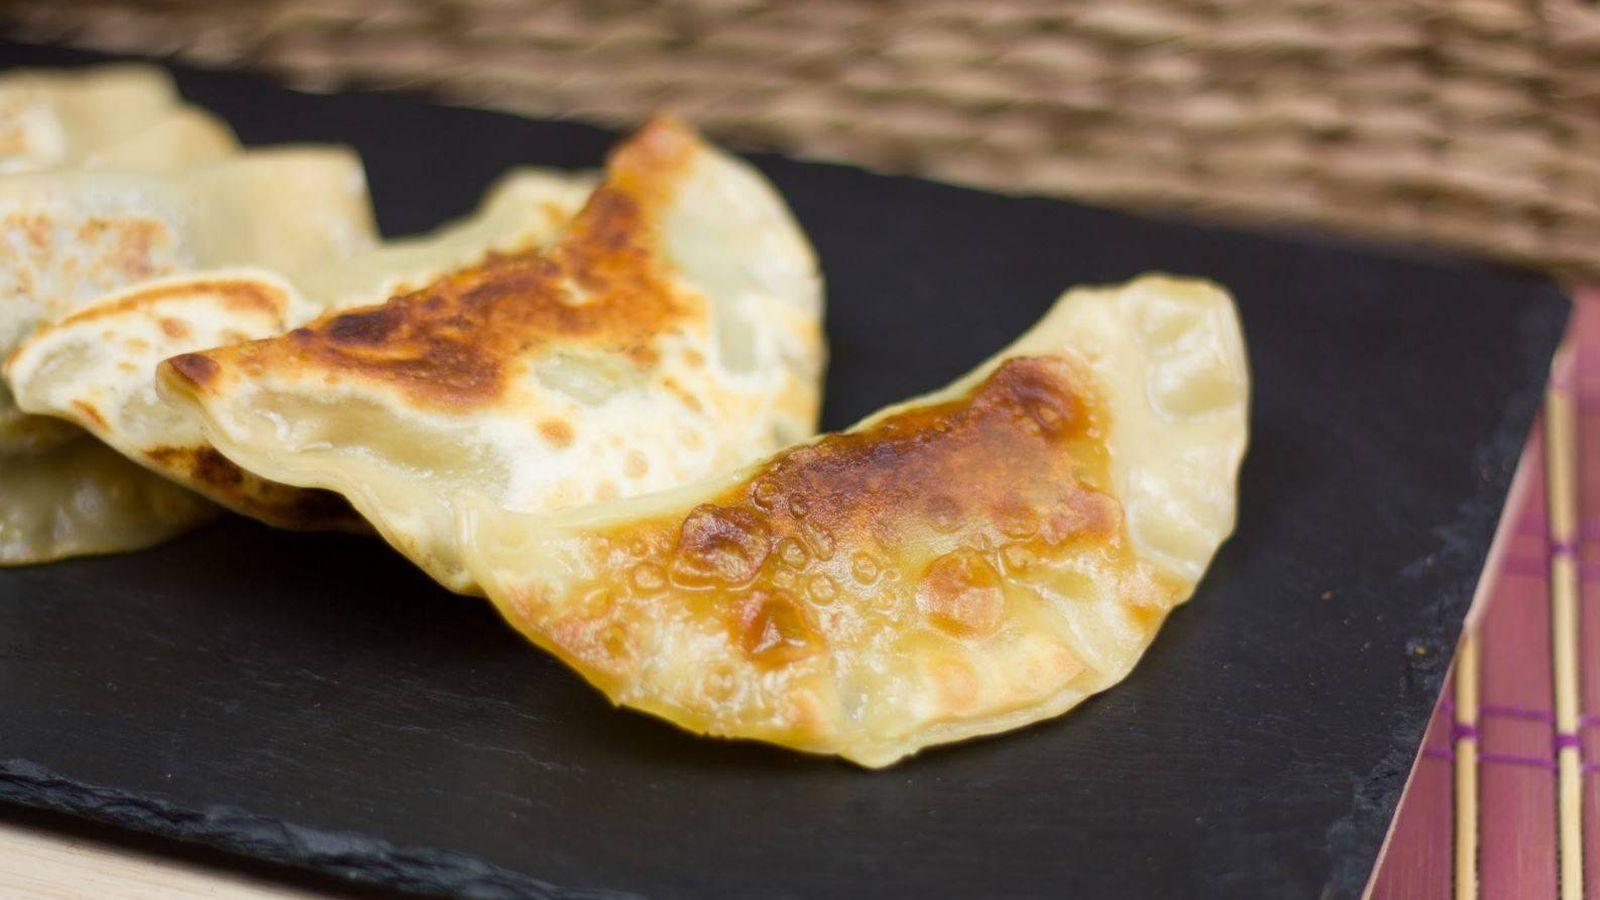 Foto: Empanadillas a la plancha